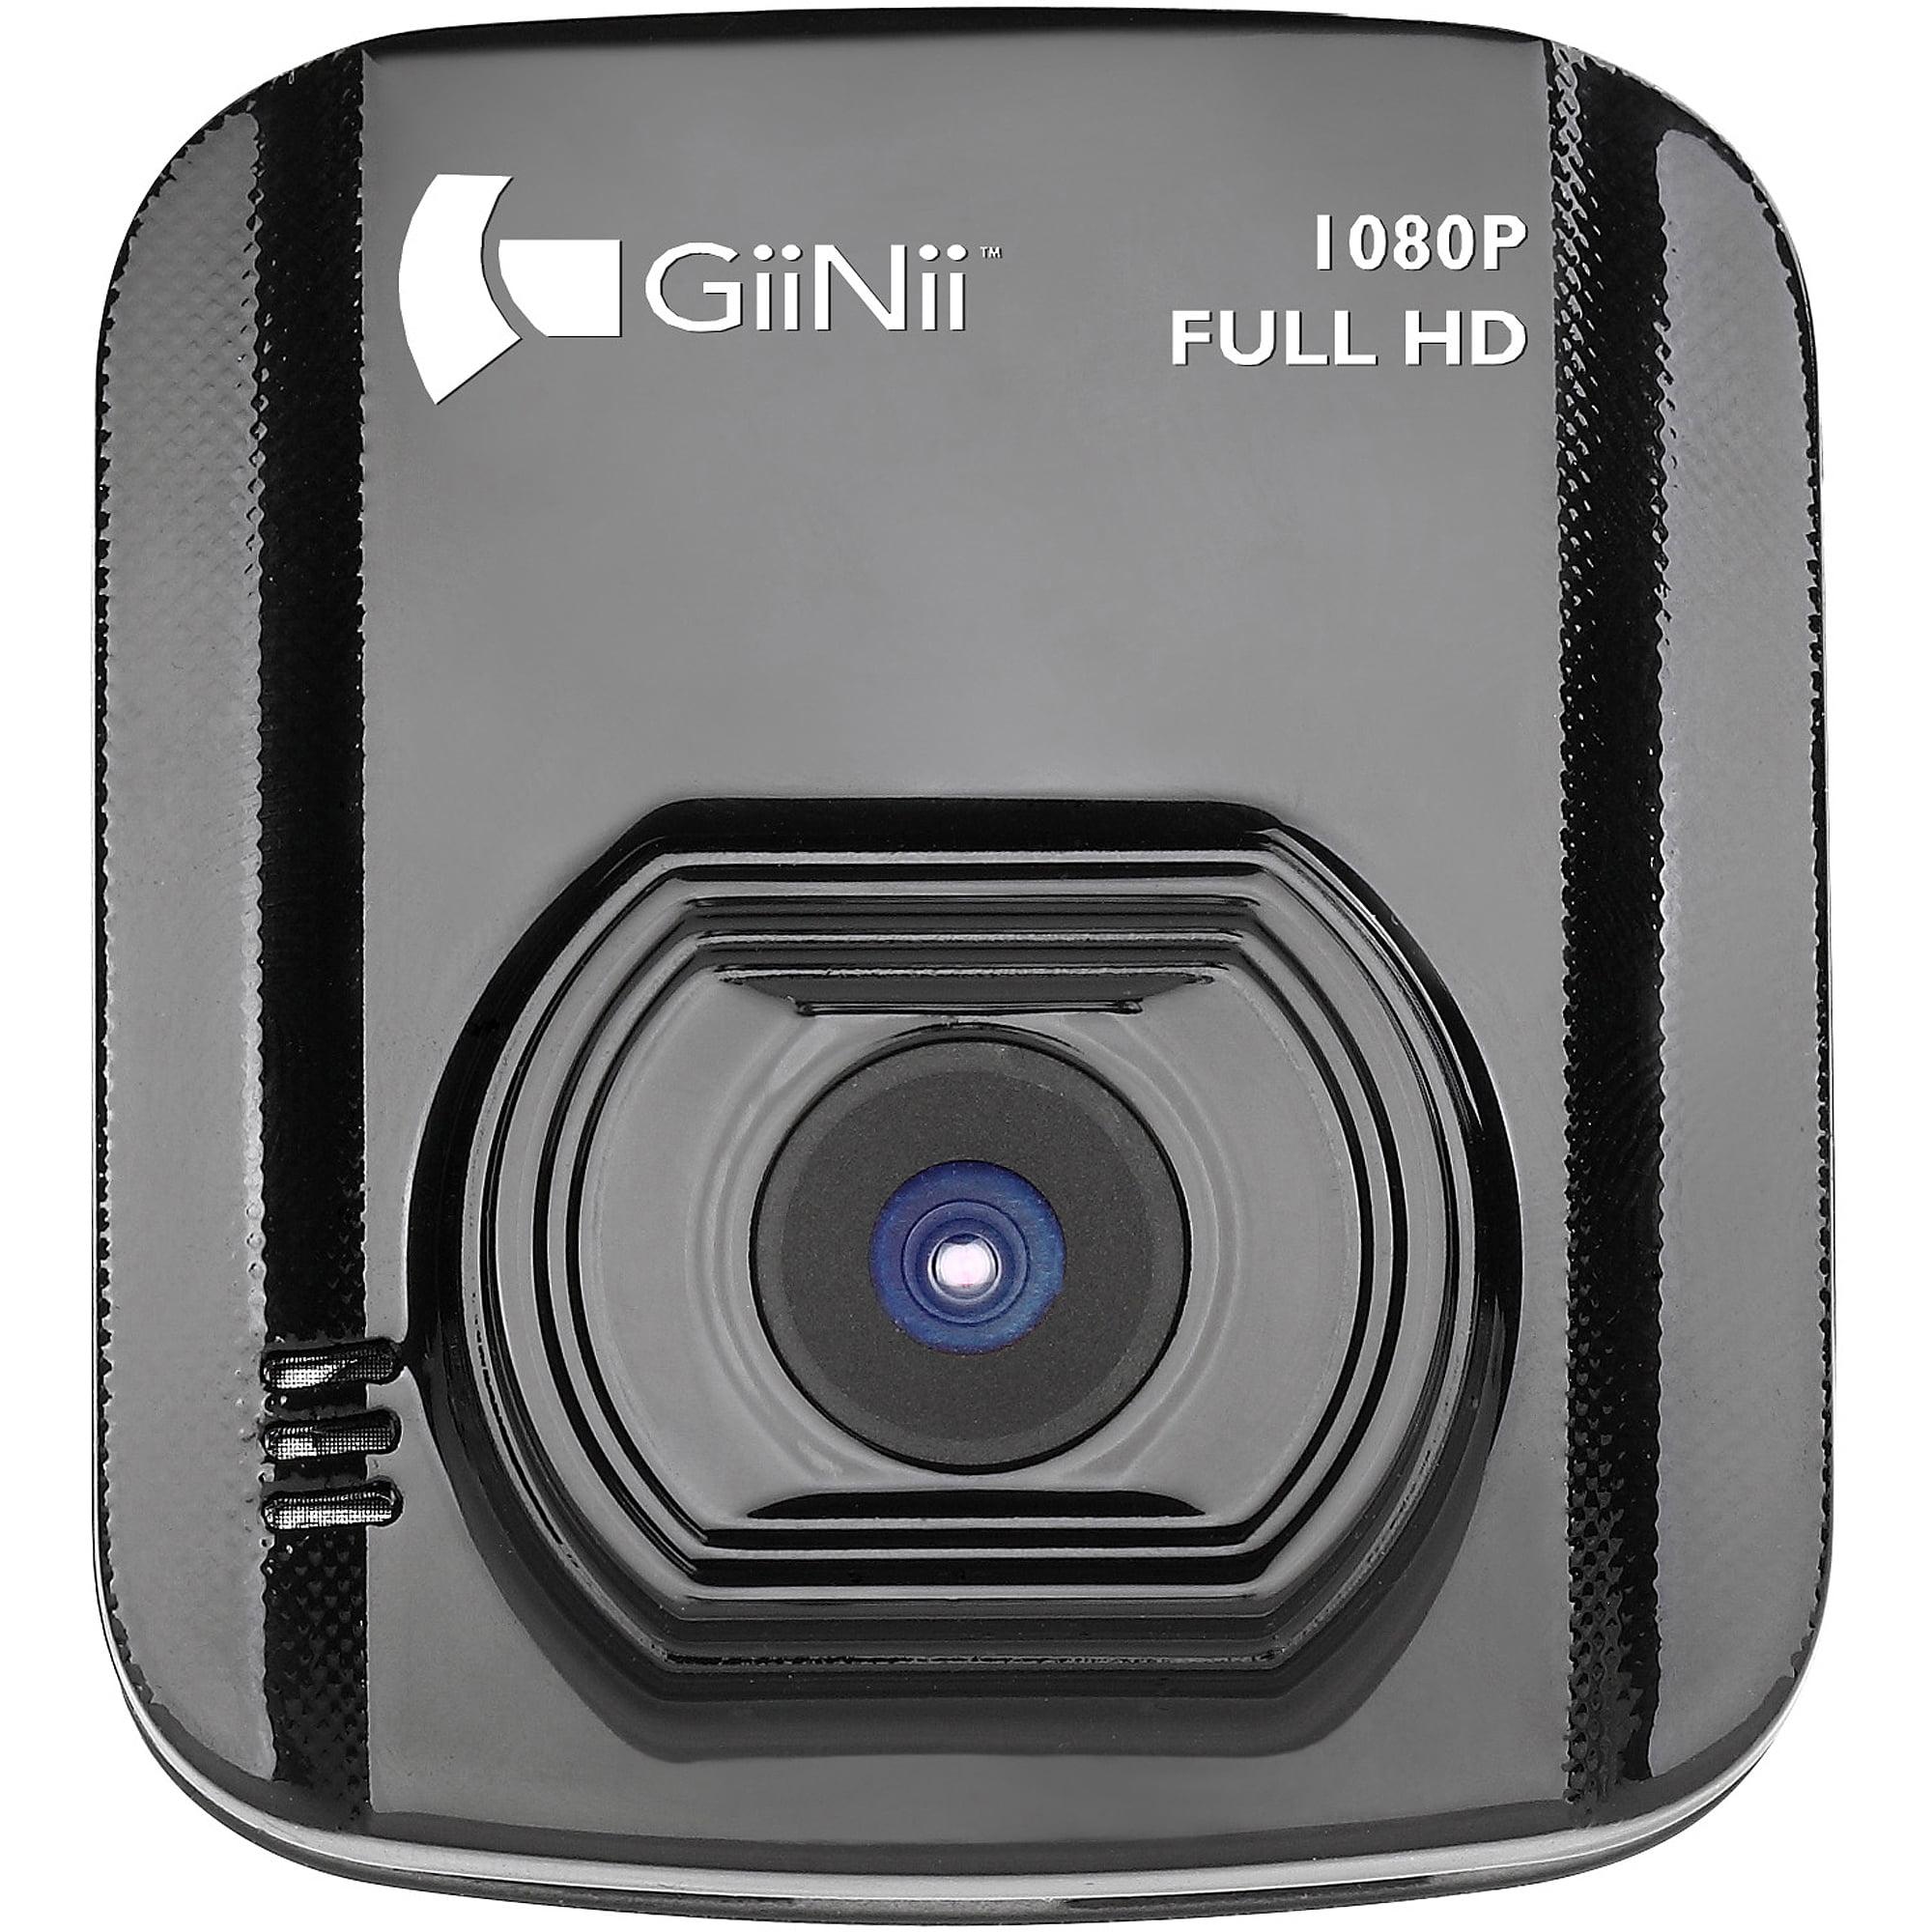 GiiNii GD-250 1080P DashCamVideo Camera with 2.0-Inch LED Backlit (Black)